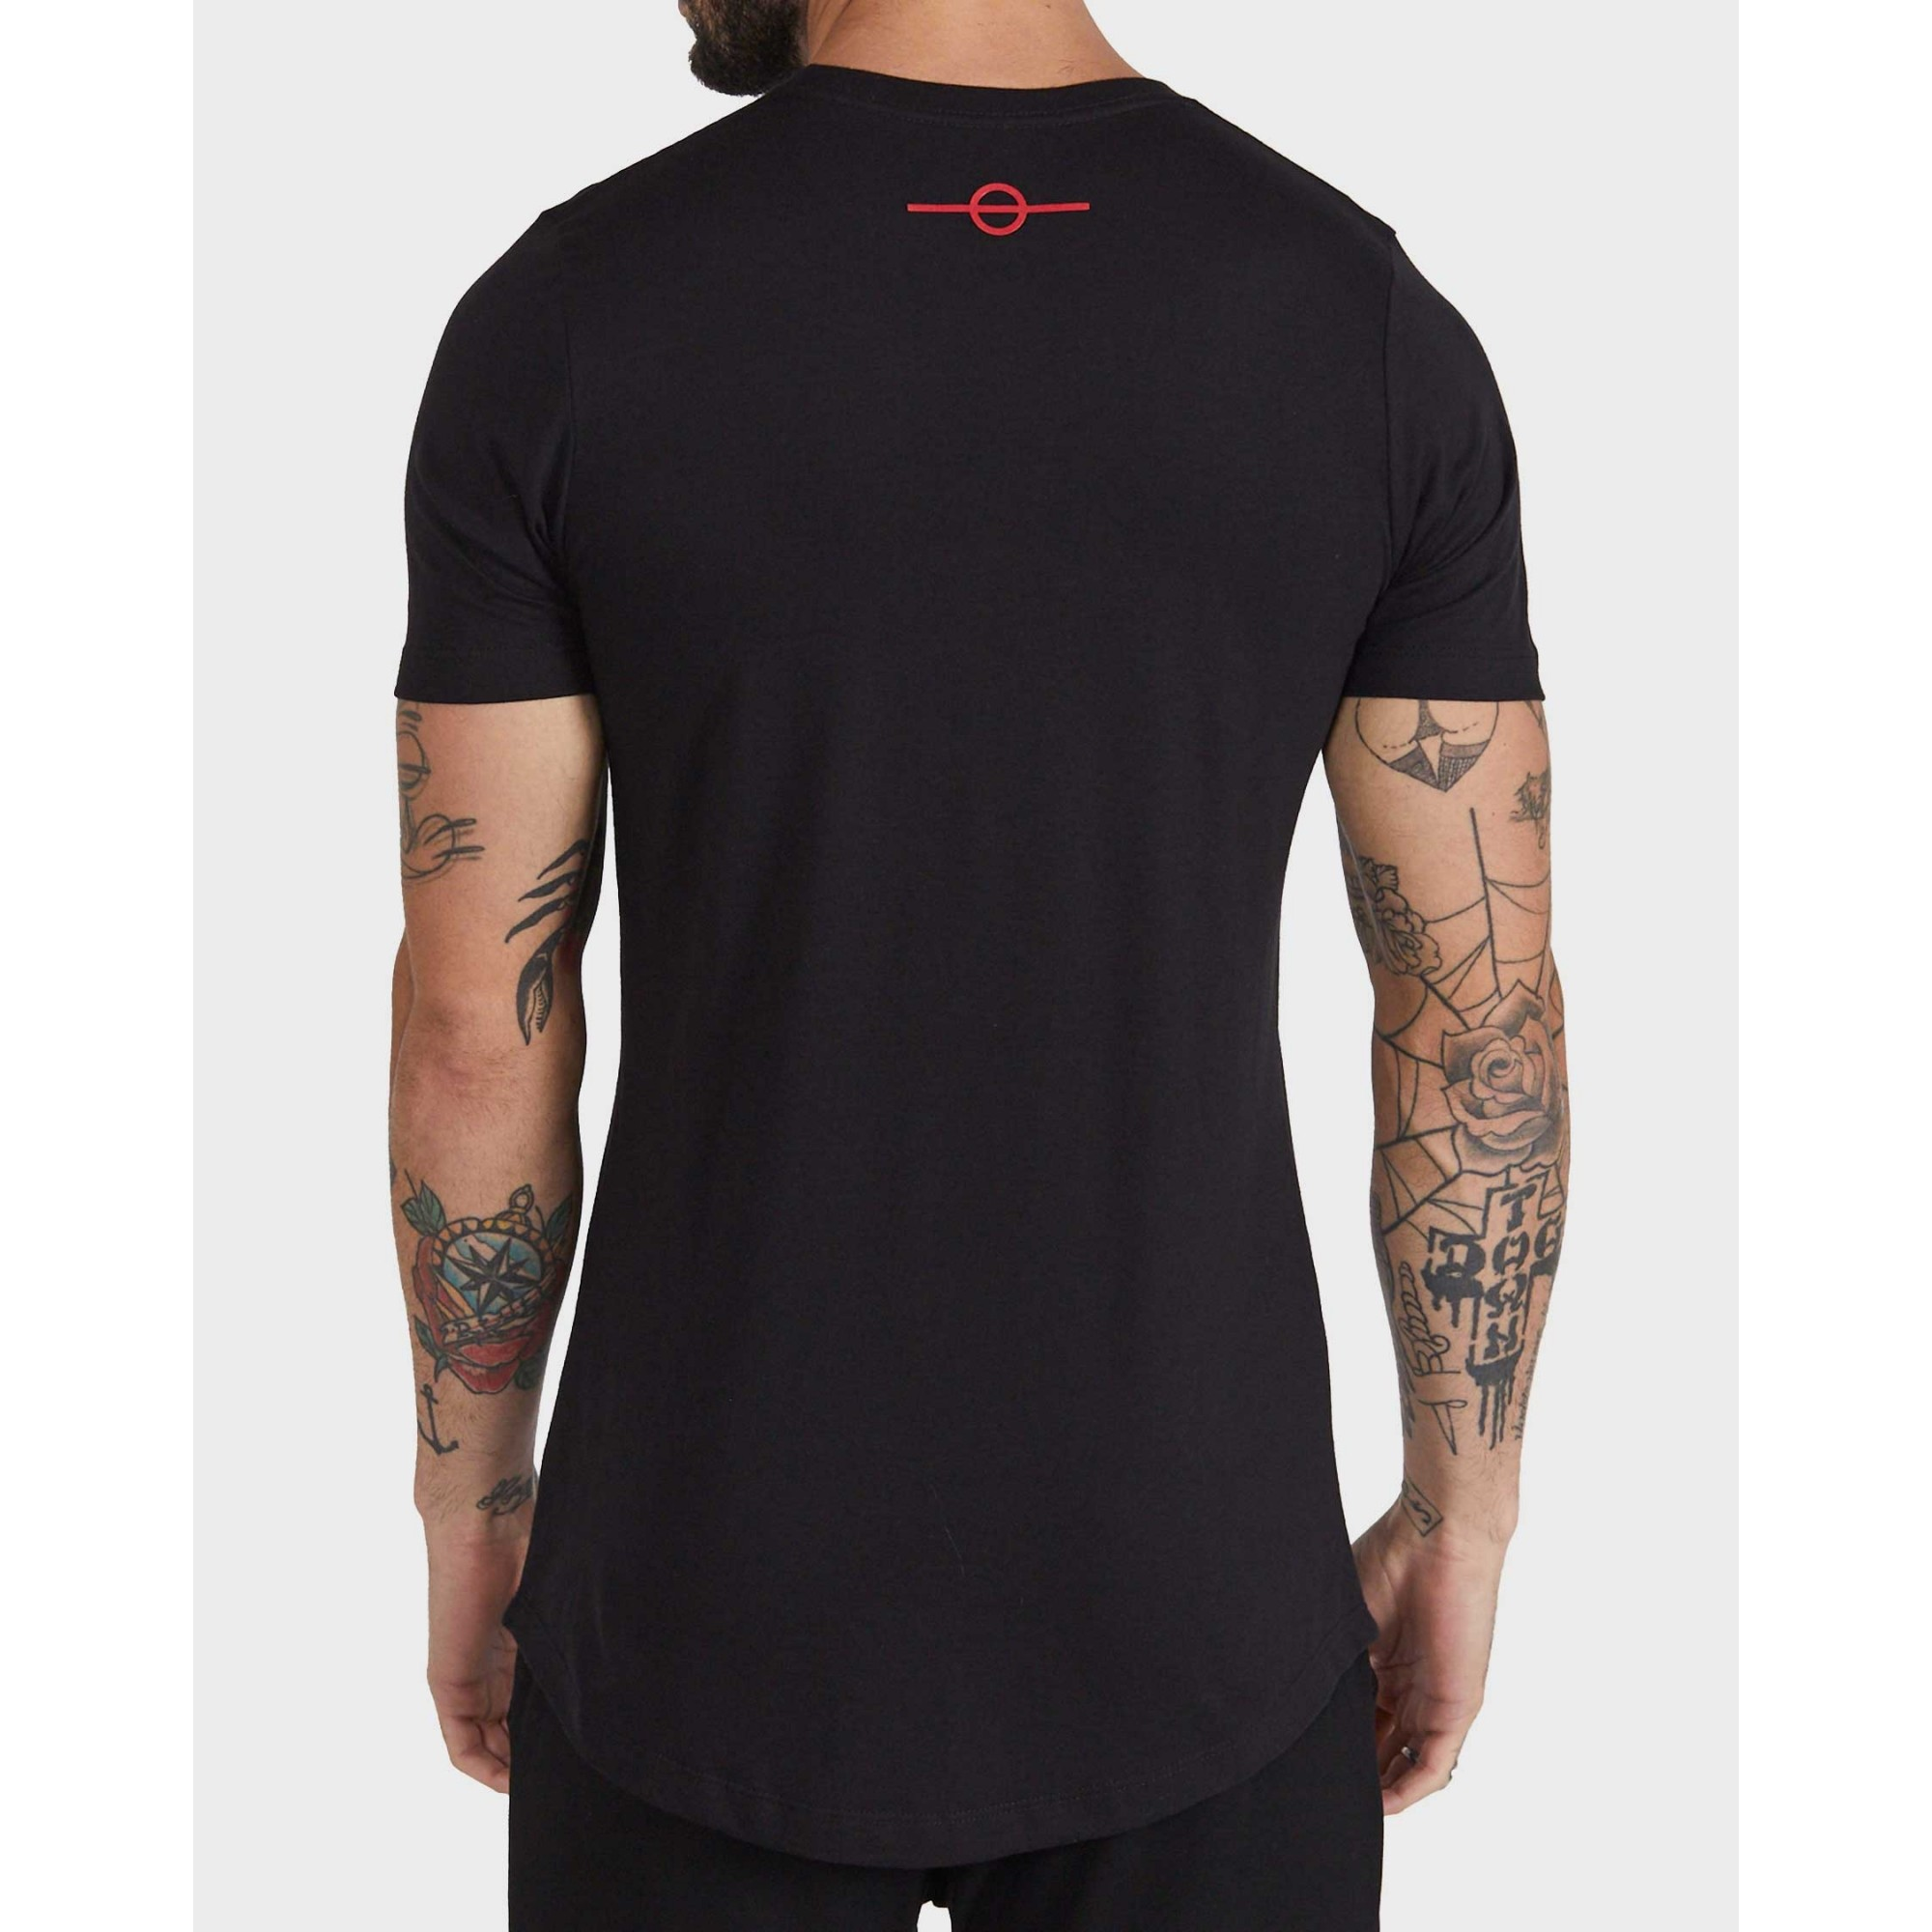 Camiseta Buh Bordado Lurex Black